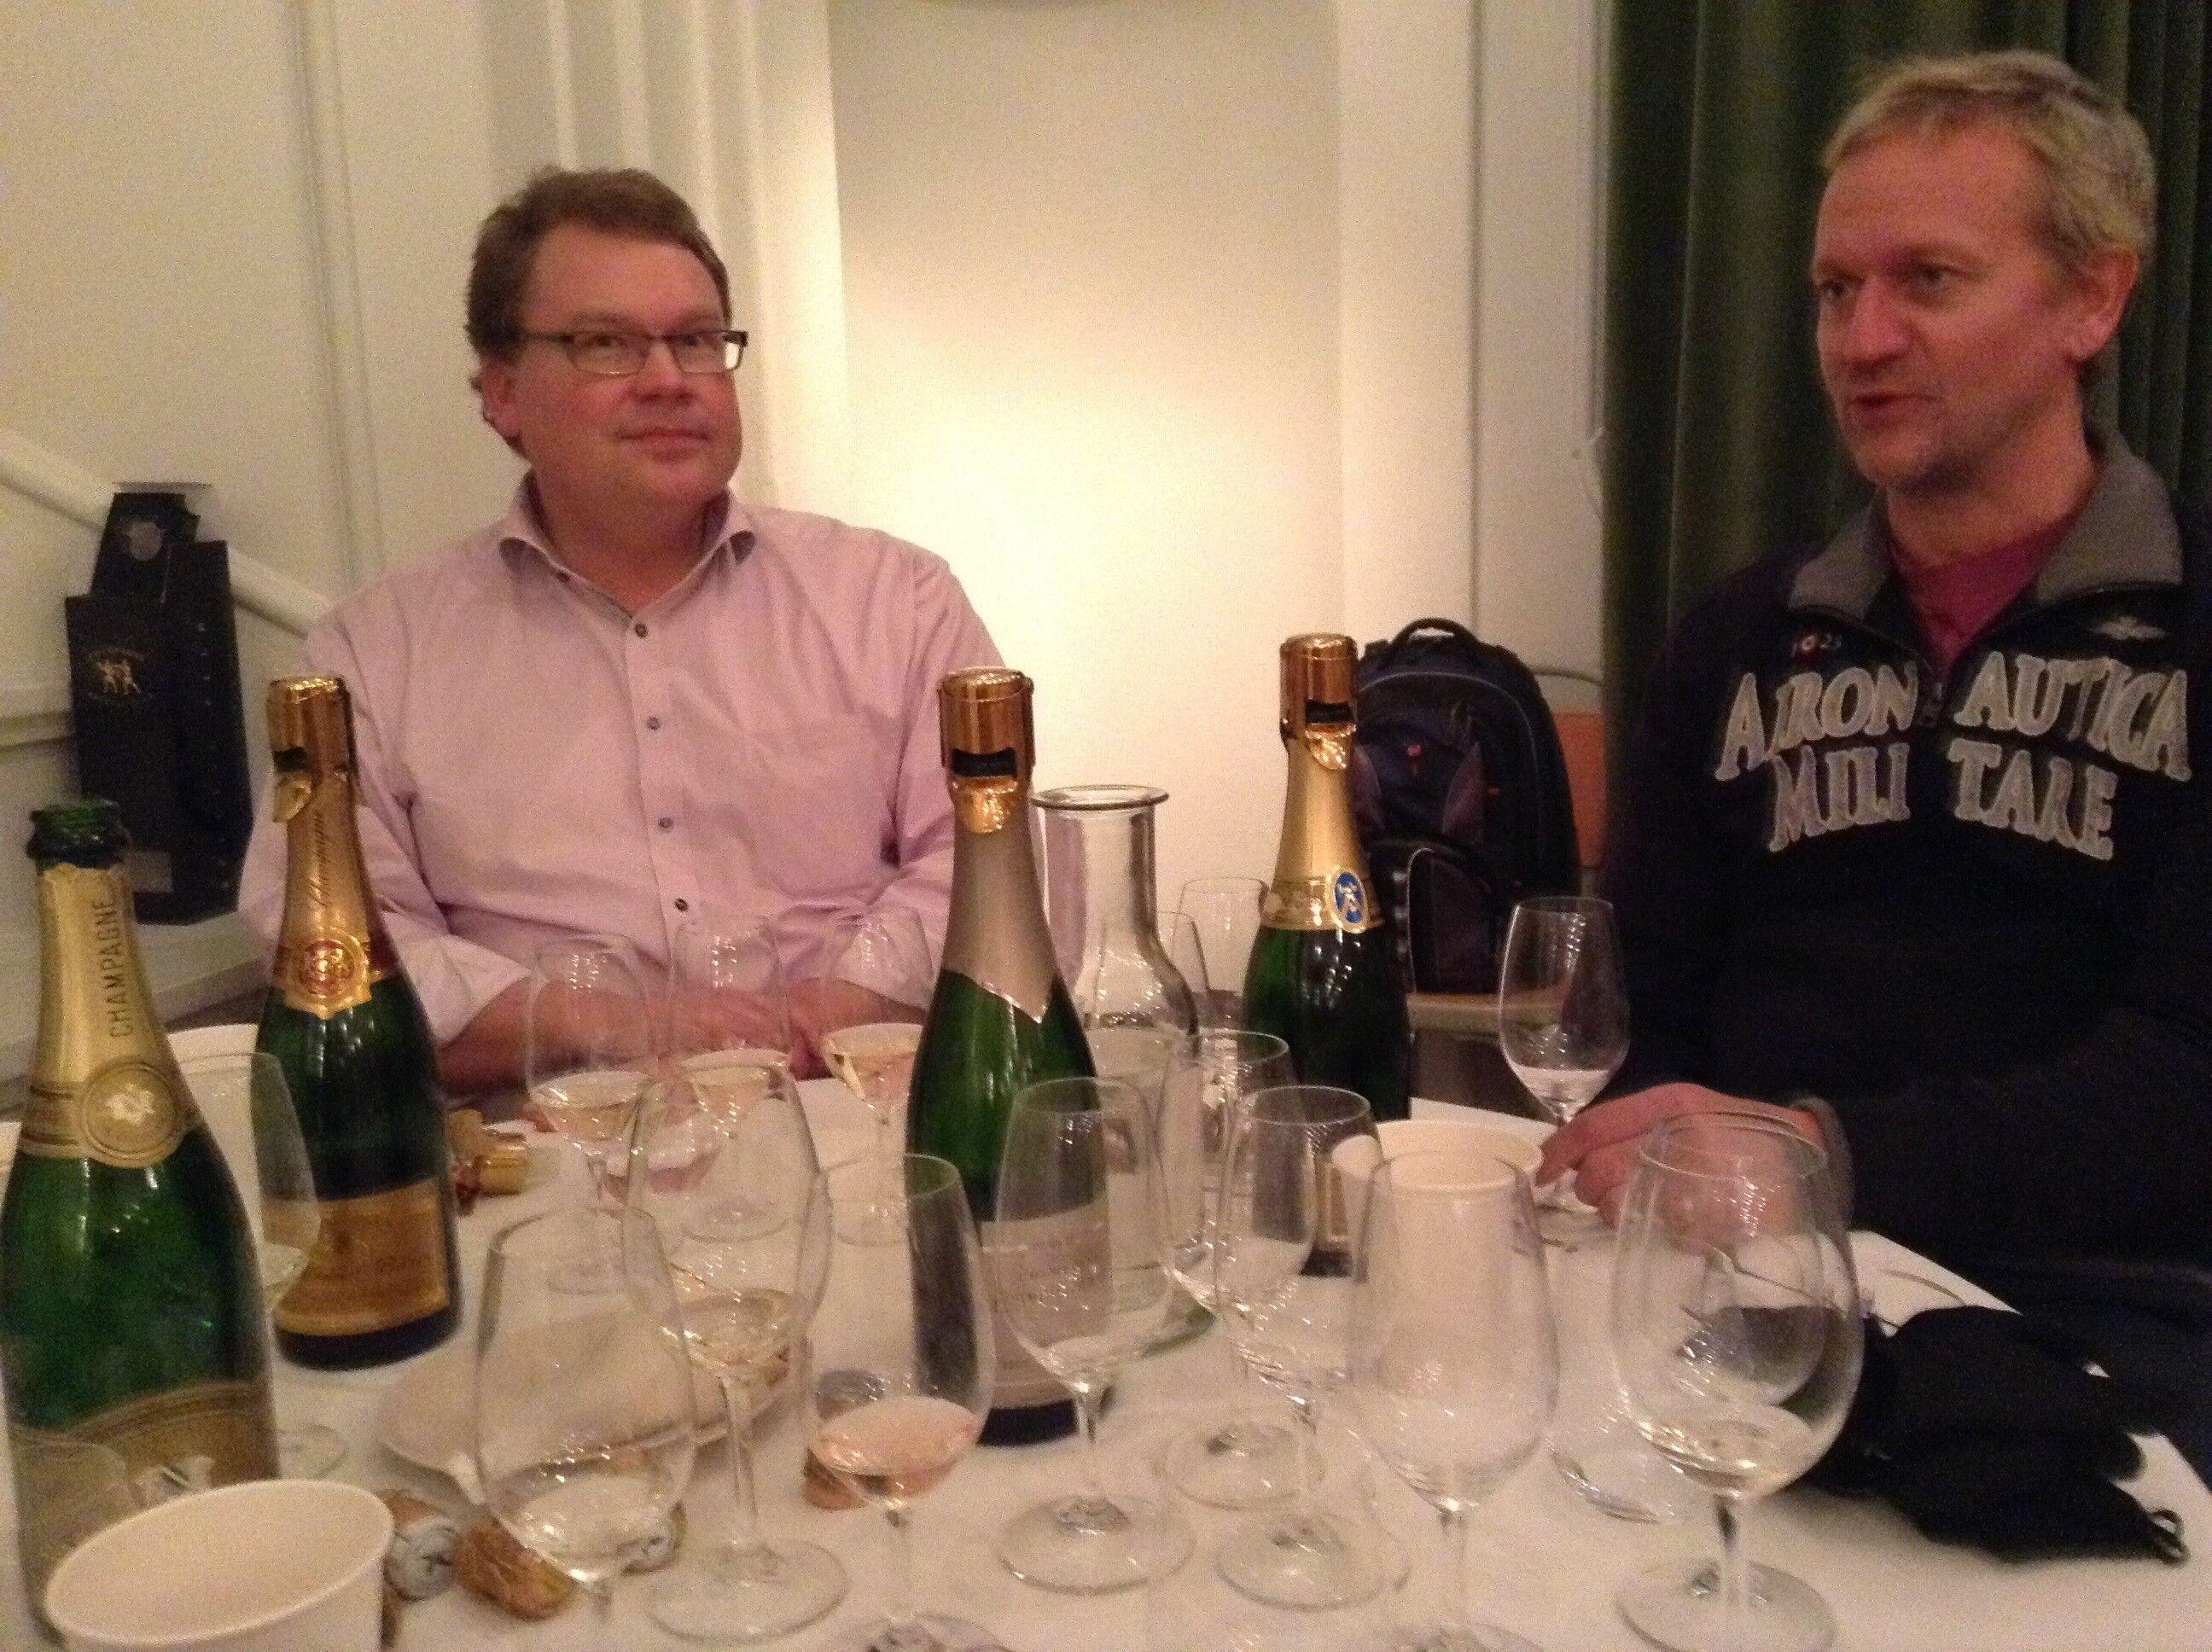 Magnus fritzell Pelle champagne